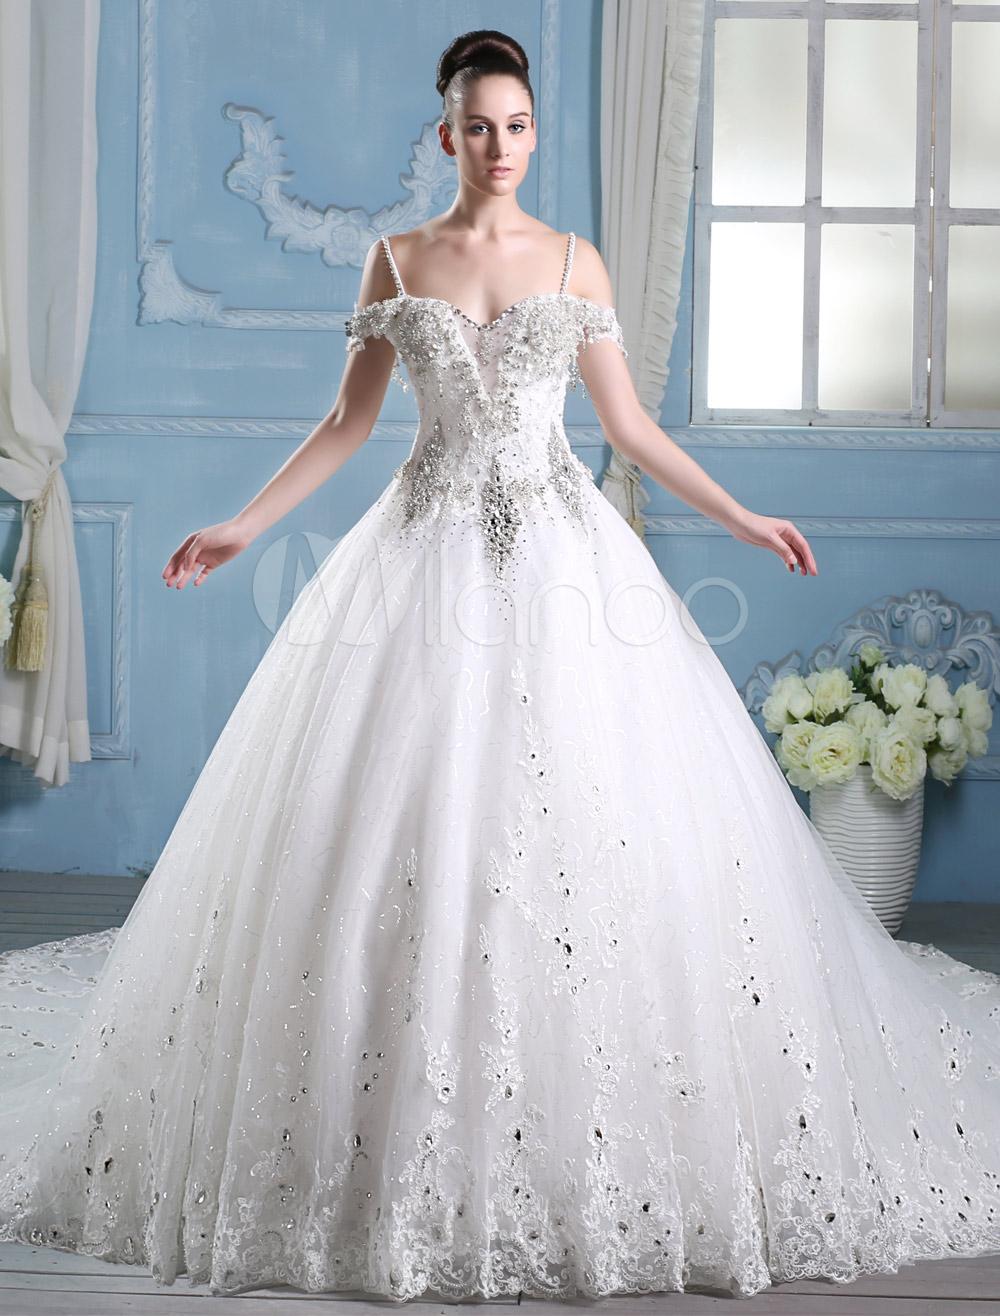 Beaded ball gown wedding dress  Wedding Dresses Ball Gown Bridal Dress Rhinestones Beaded Straps